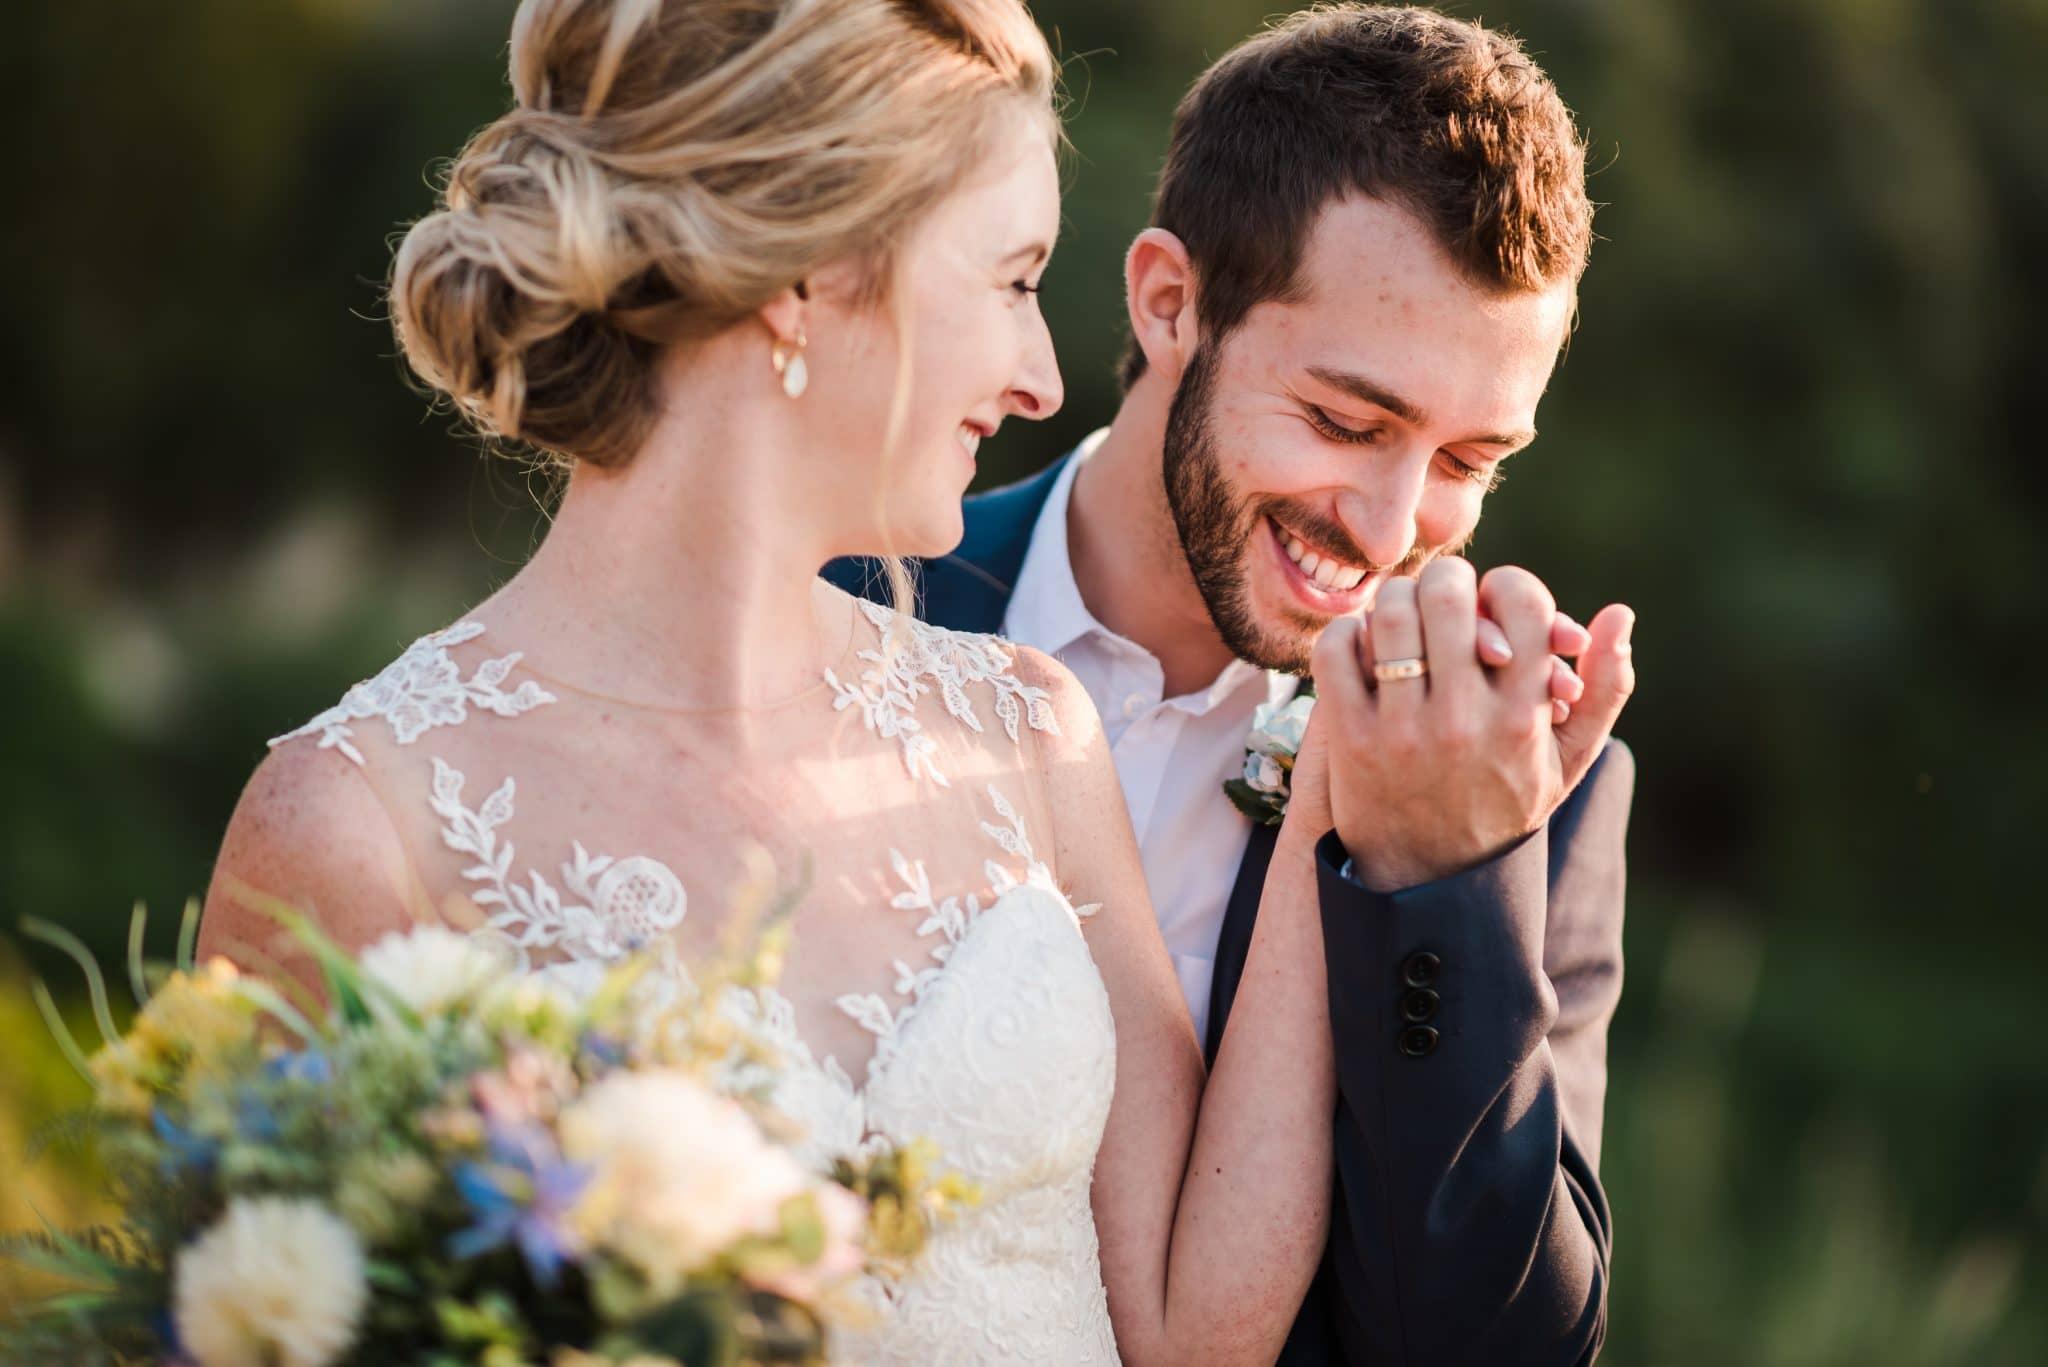 Paphos wedding photographer - Two beautiful souls Adam and Lydia